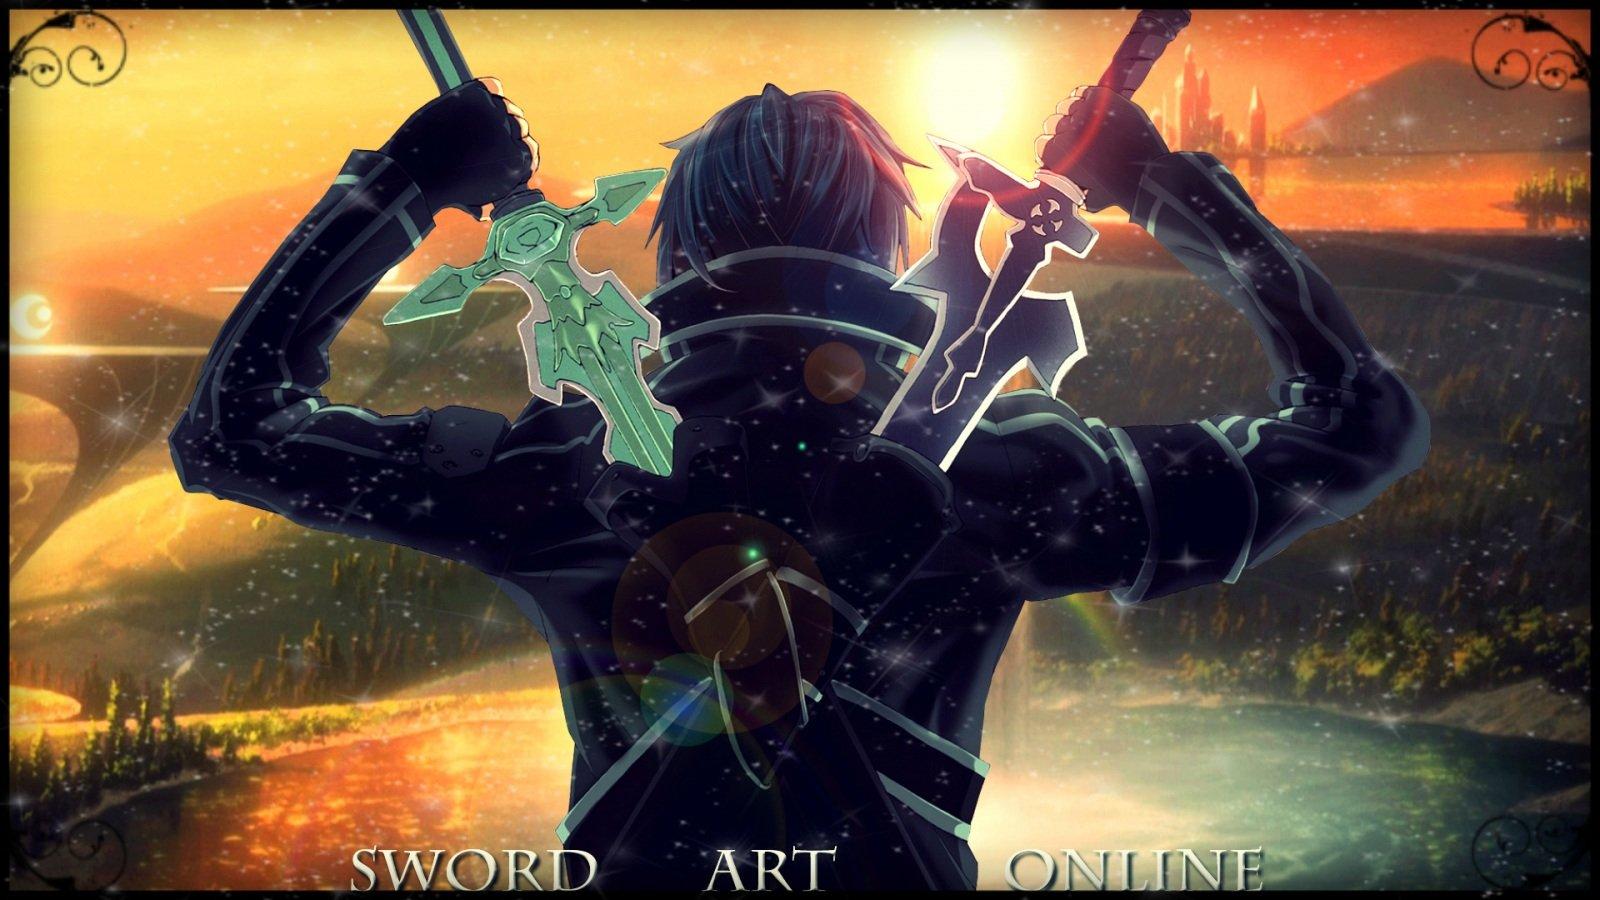 kirigaya kazuto sword art online tagme wallpaper 1600x900 367835